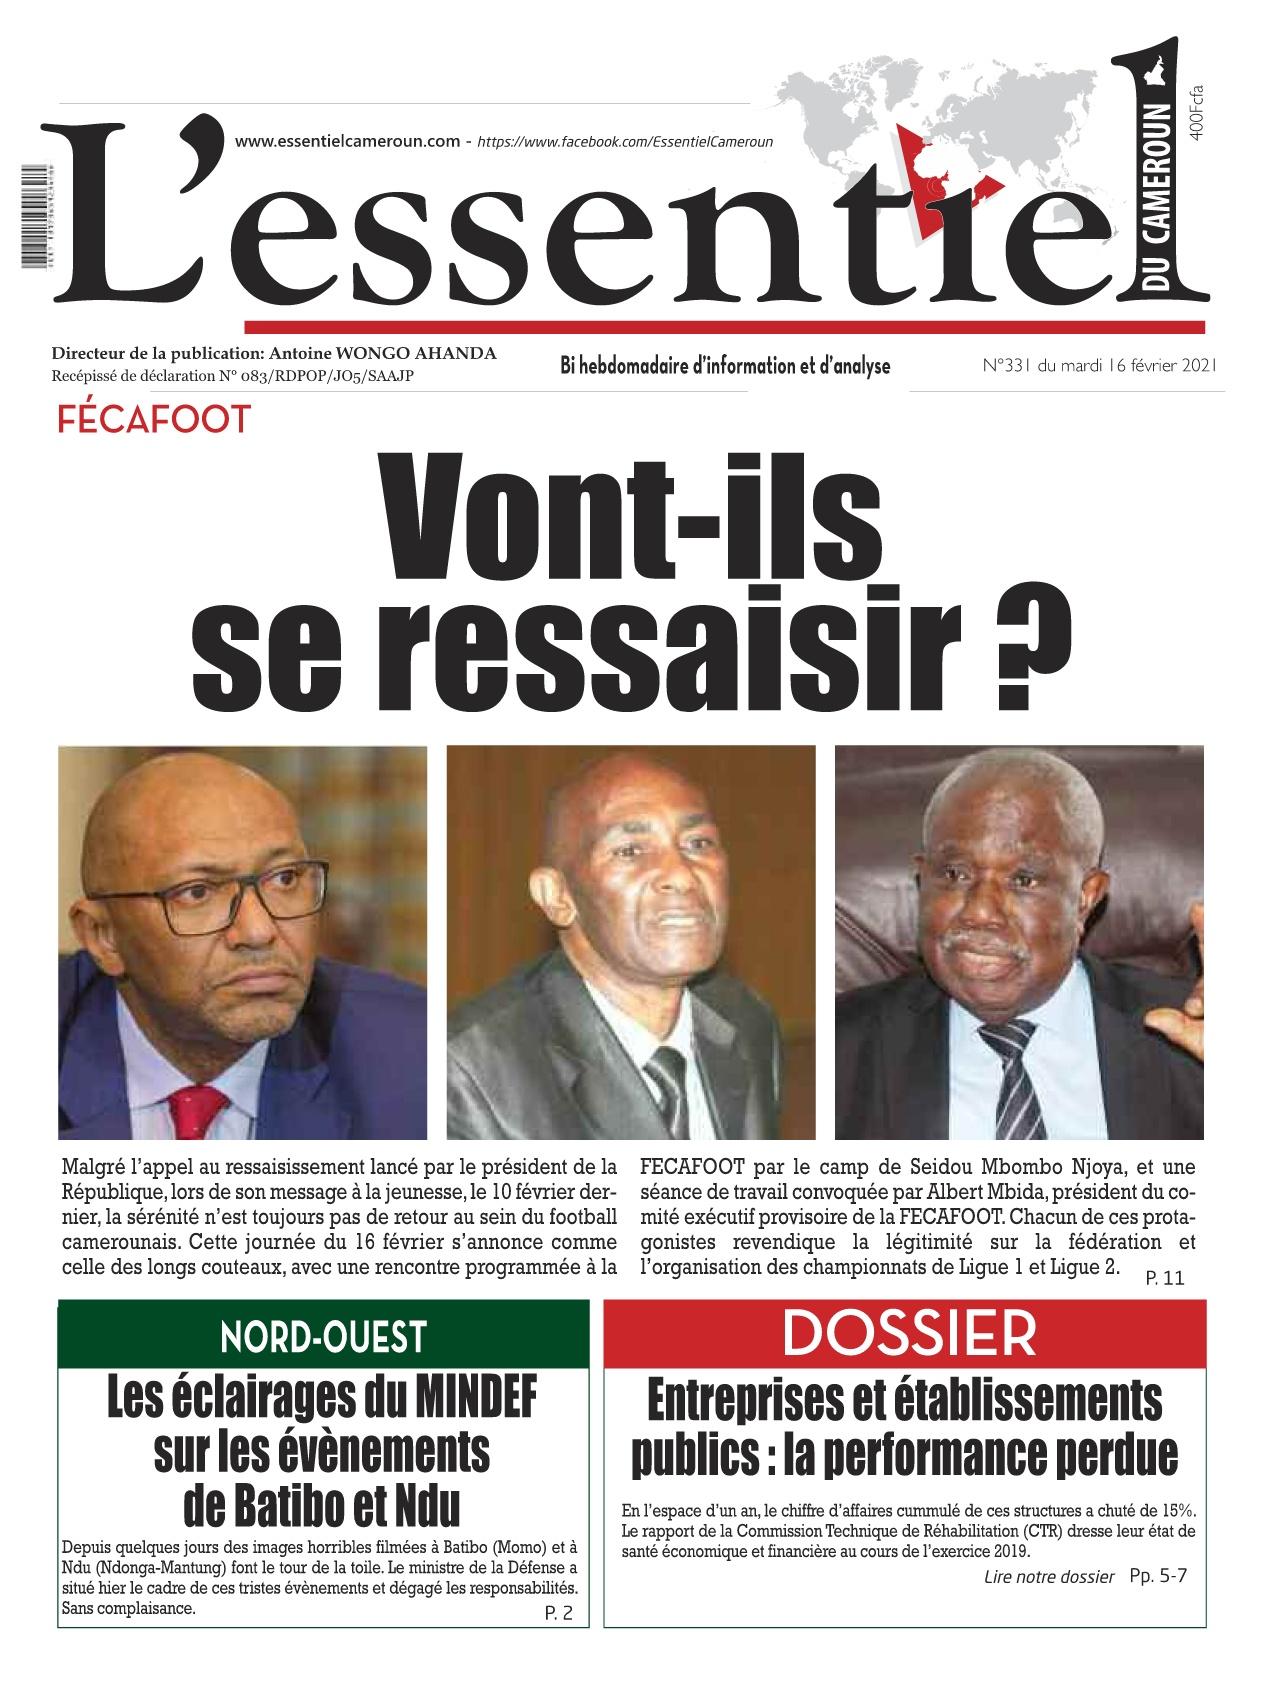 L'essentiel du Cameroun - 17/02/2021